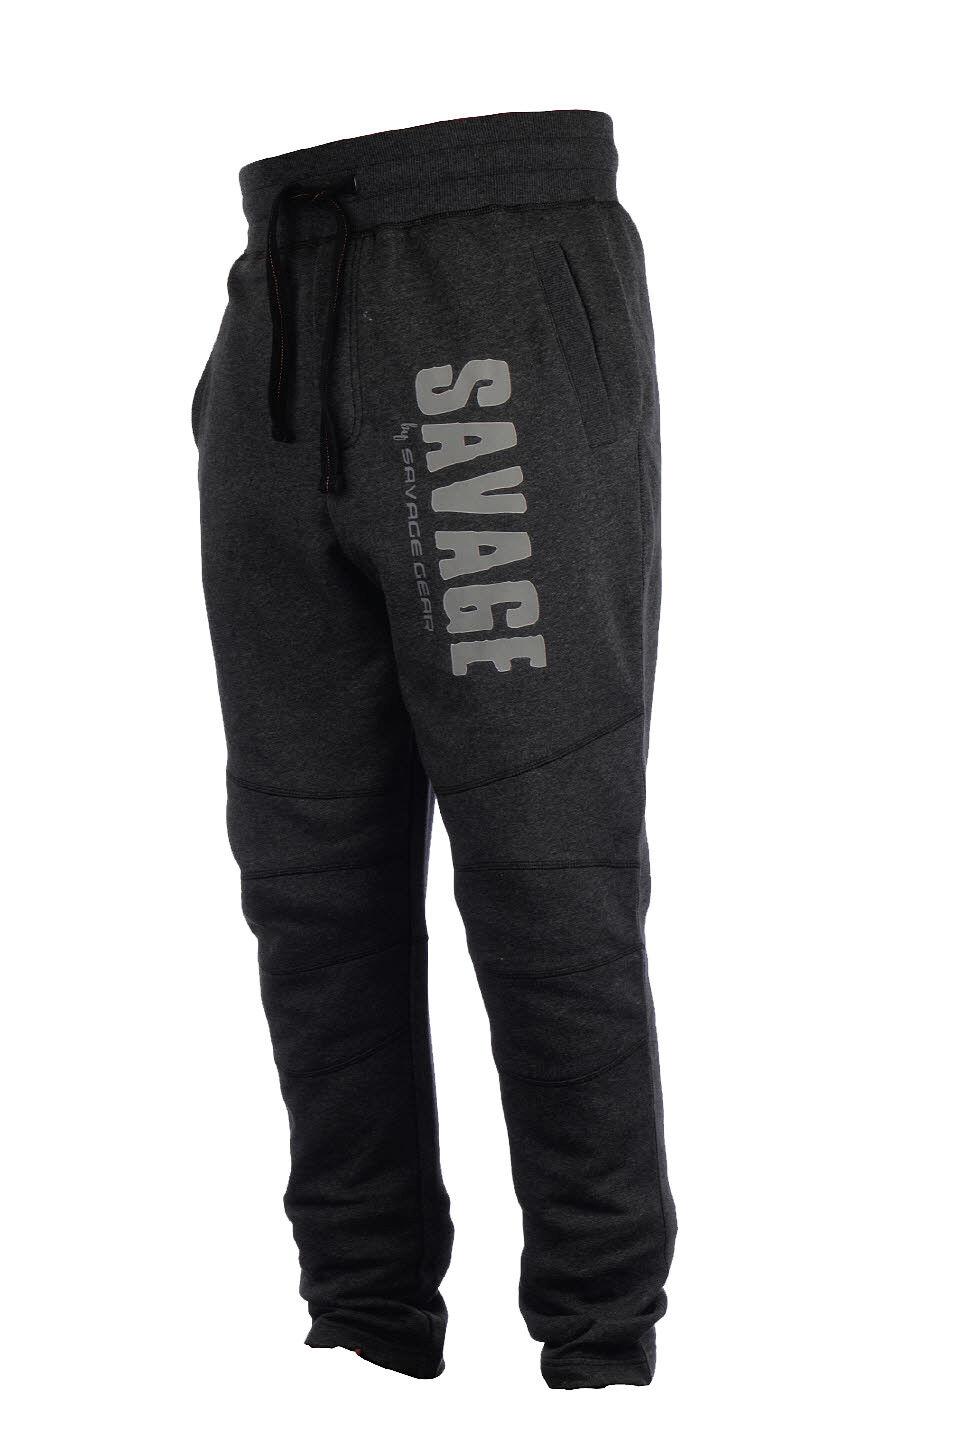 SAVAGE GEAR Simply Savage Hoodie Pullover M by TACKLE-DEALS !!